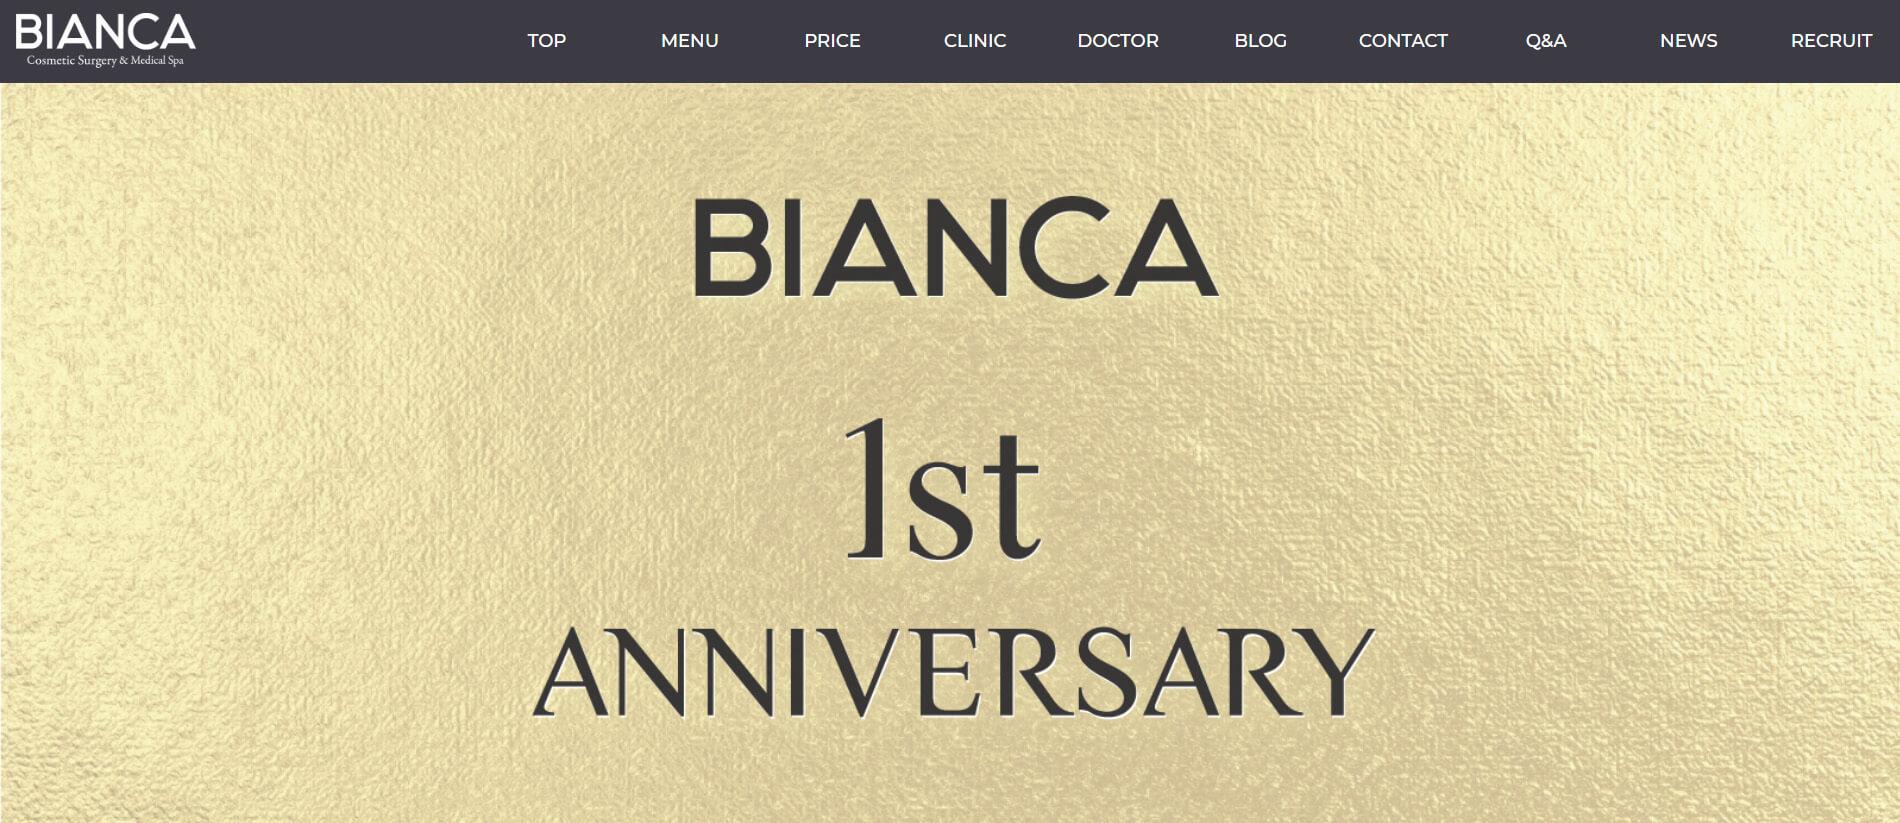 BIANCA CLINIC(ビアンカクリニック)銀座のスクリーンショット